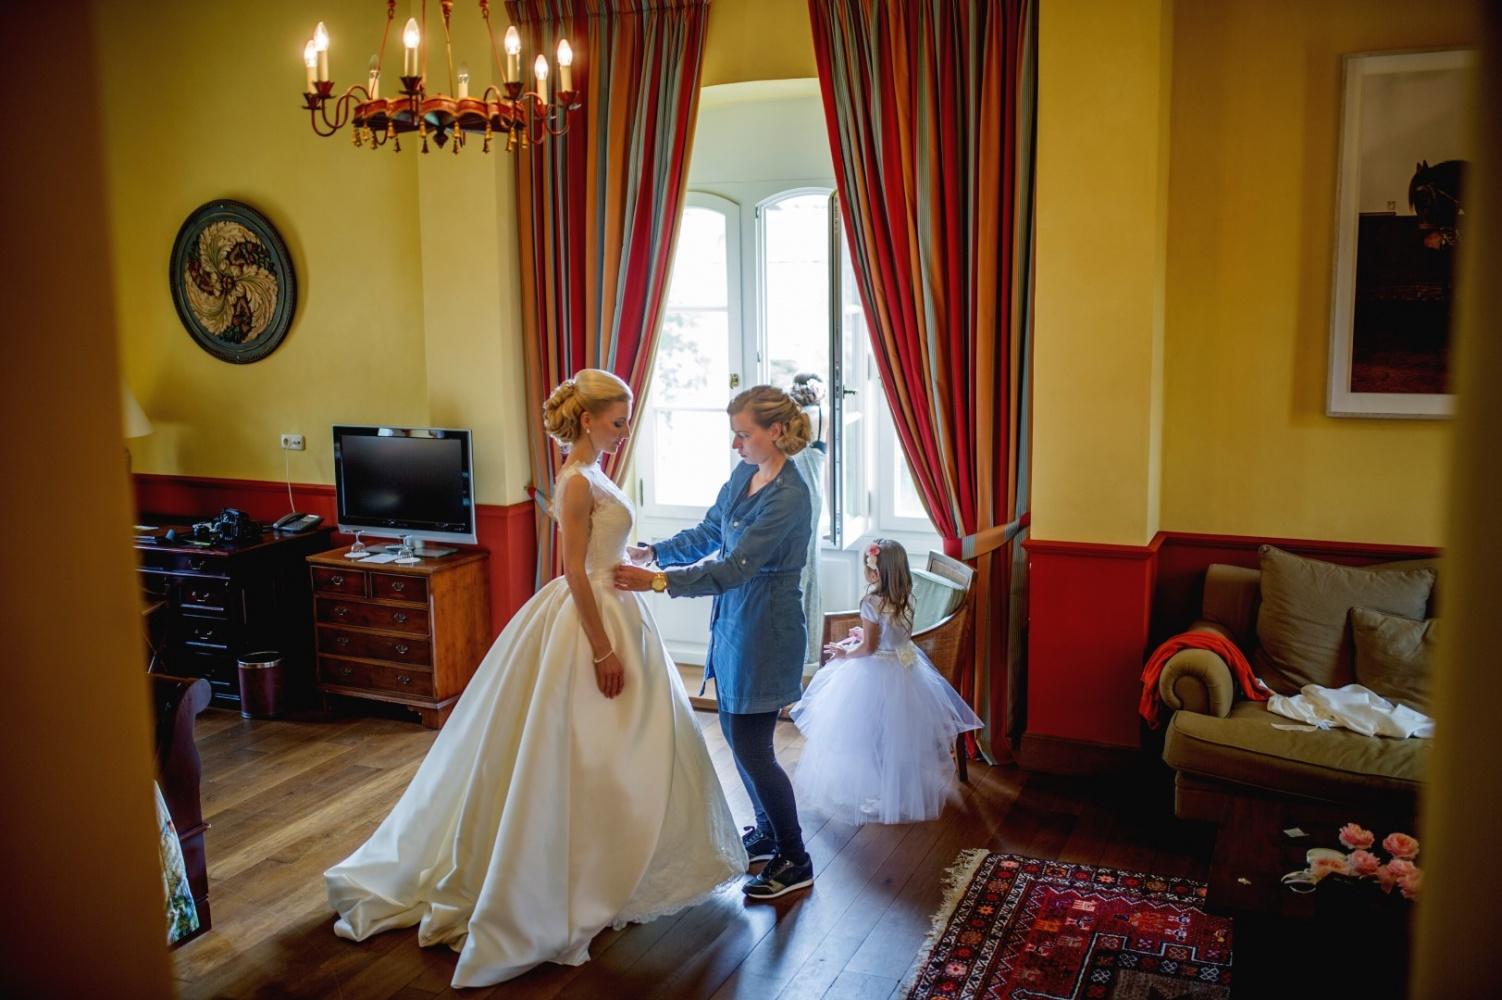 http://www.fotoz.sk/images/gallery-26/normal/svadba_hotel-chateau-bela_033.jpg